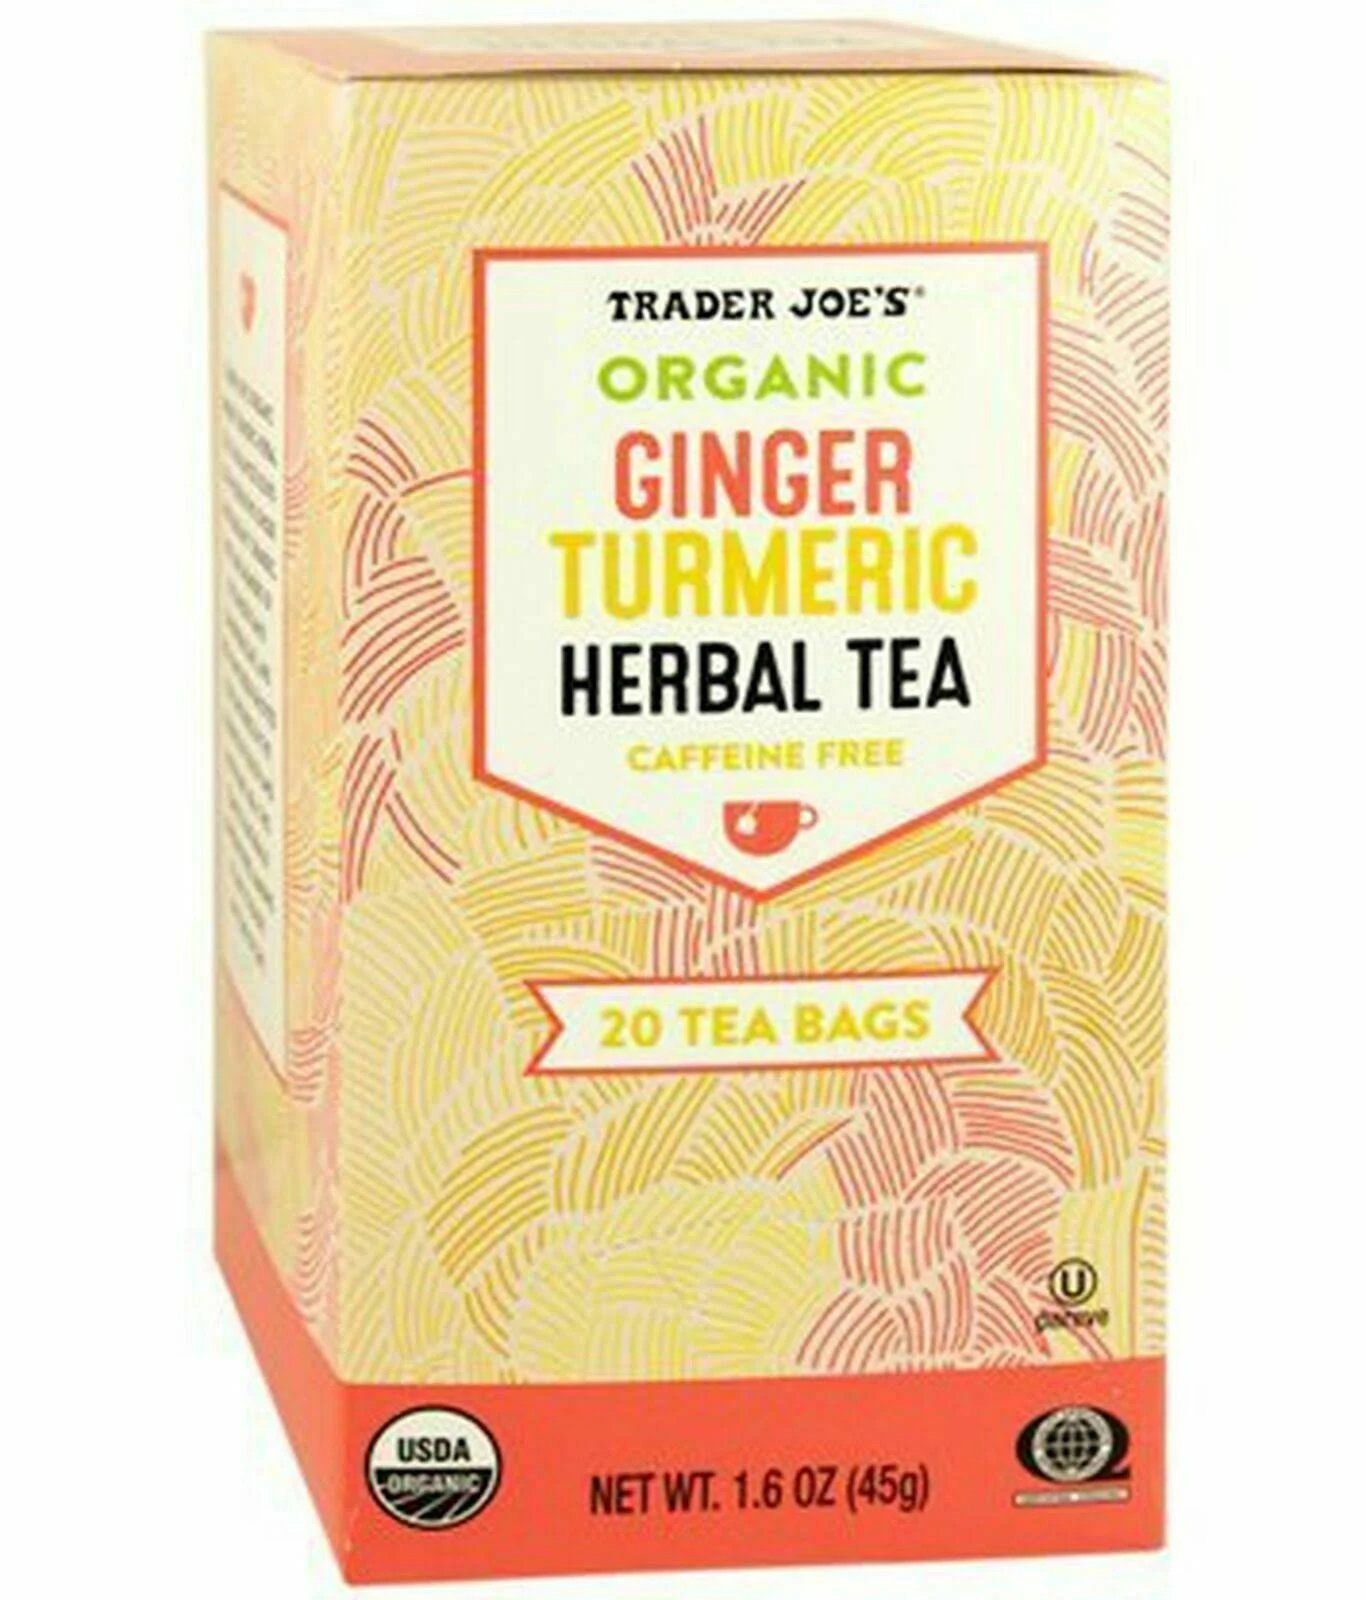 Trader Joe's Organic Ginger Turmeric Tea